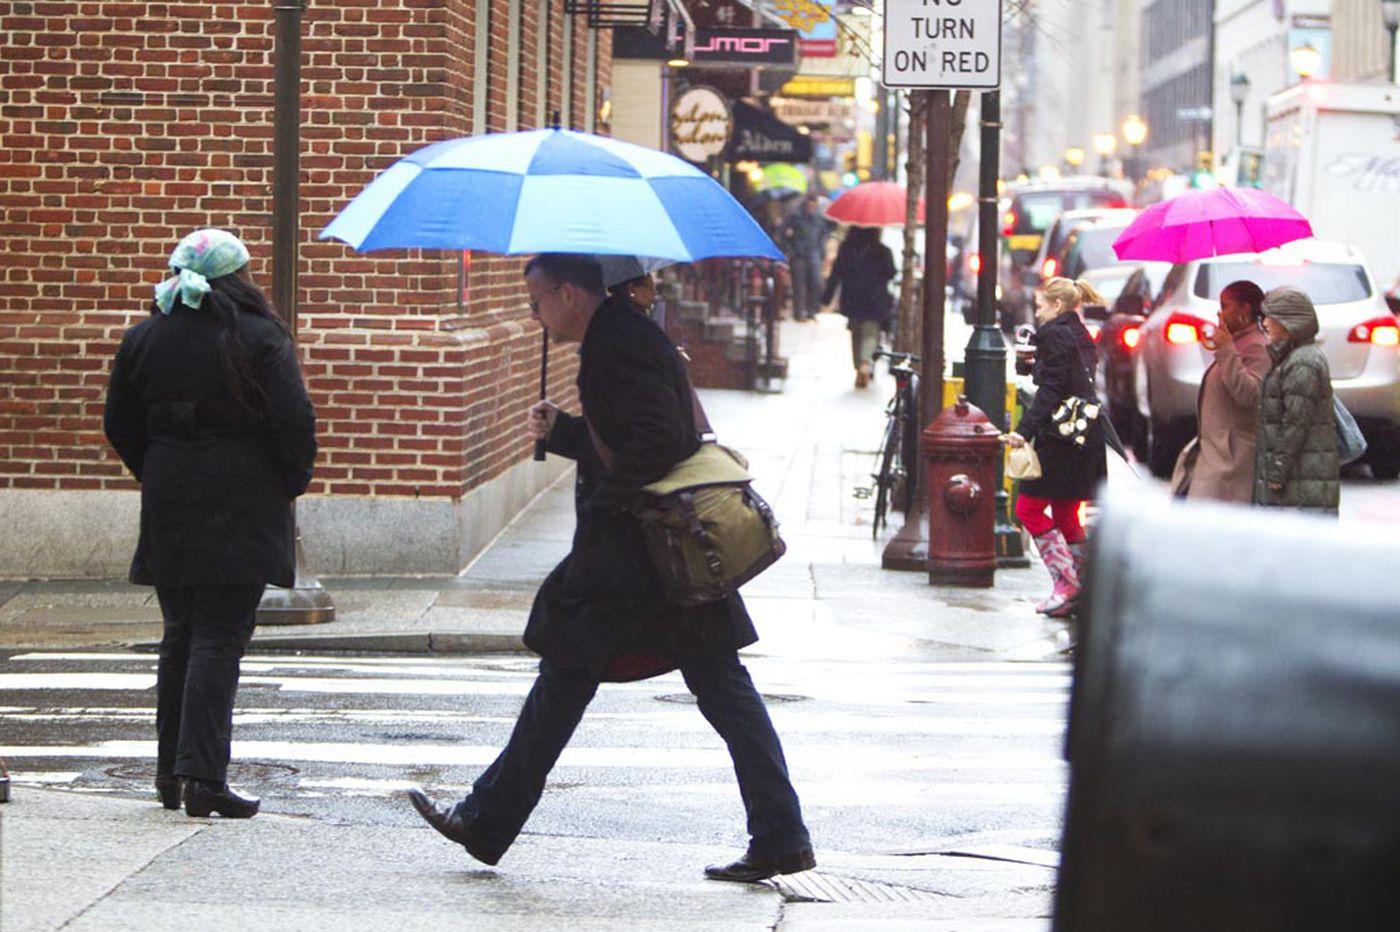 Philadelphia area braces for heavy rain, possible flooding as winter is set to debut